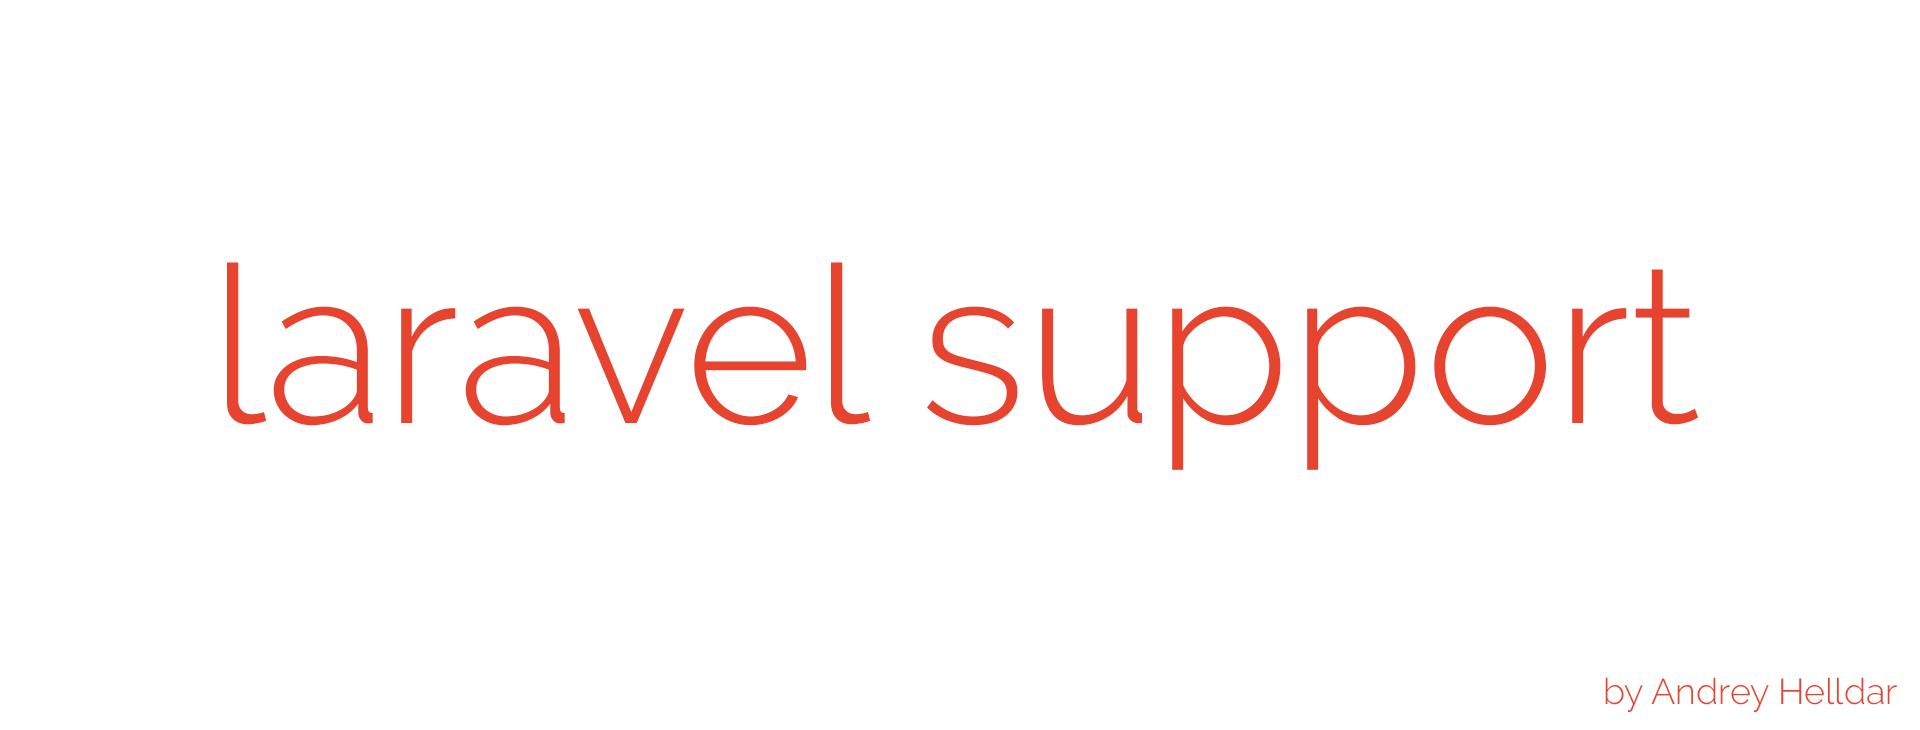 laravel support